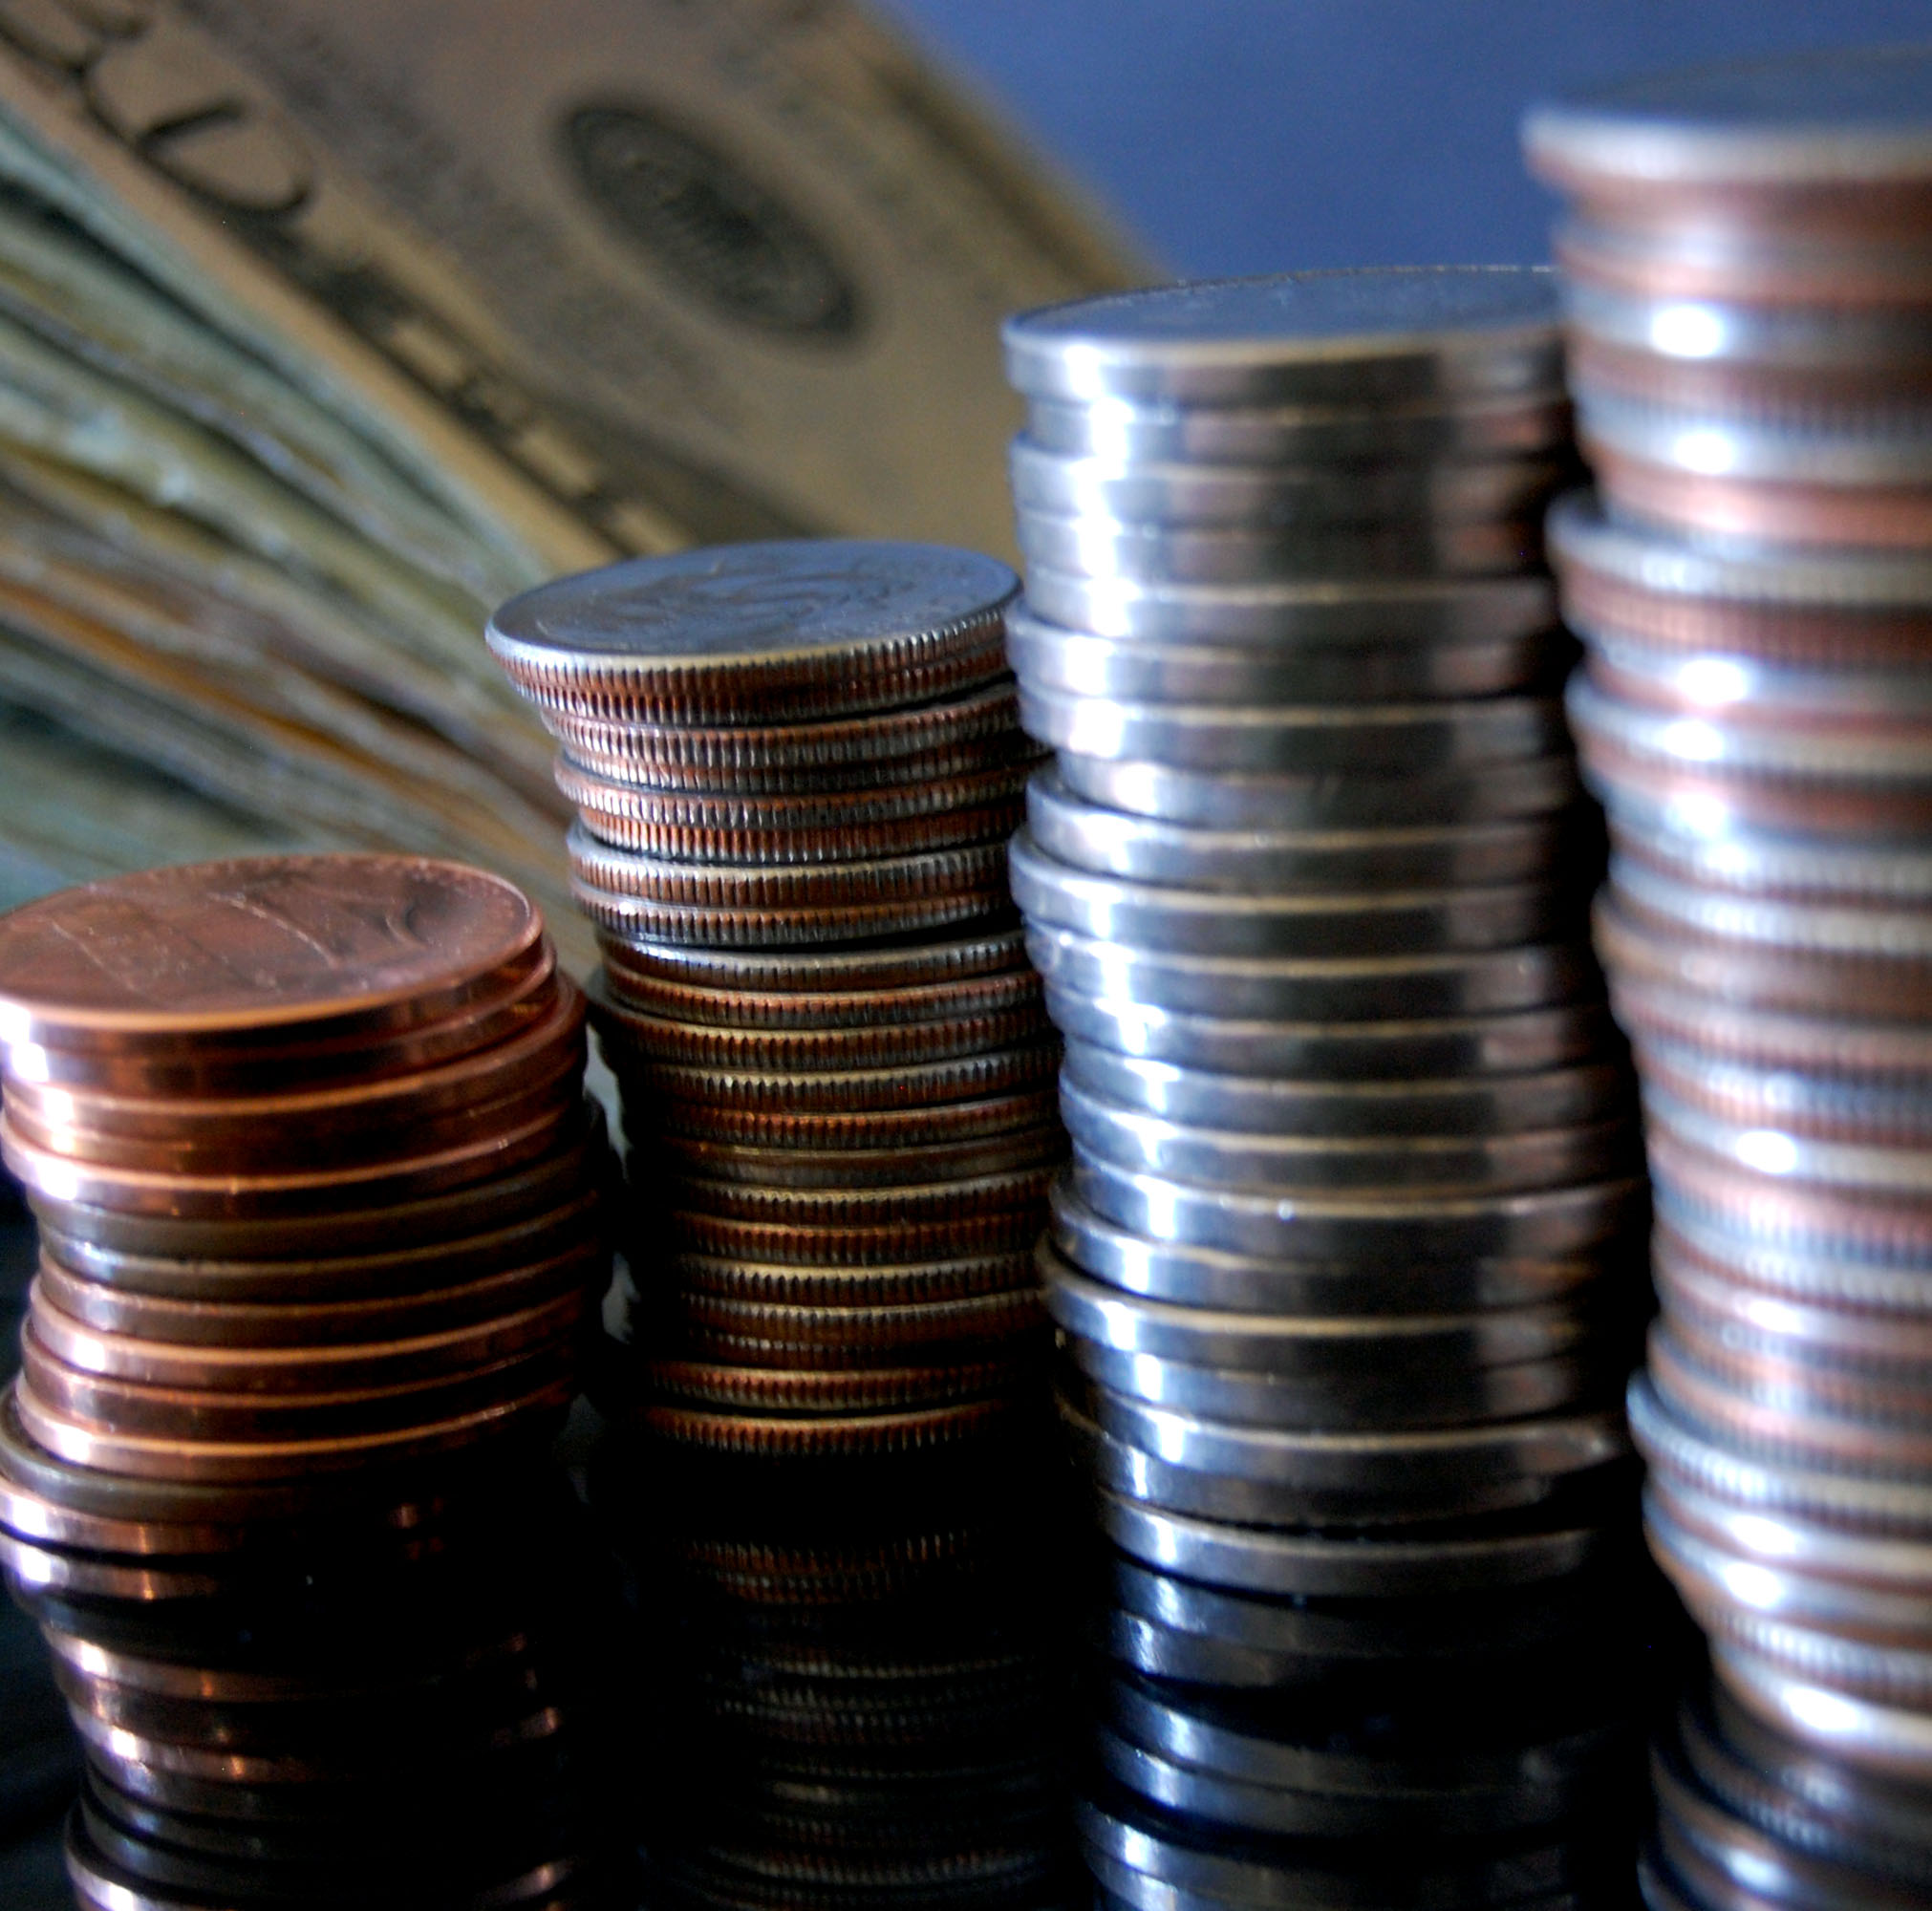 CircleBack Lending leases new HQ in Boca Raton